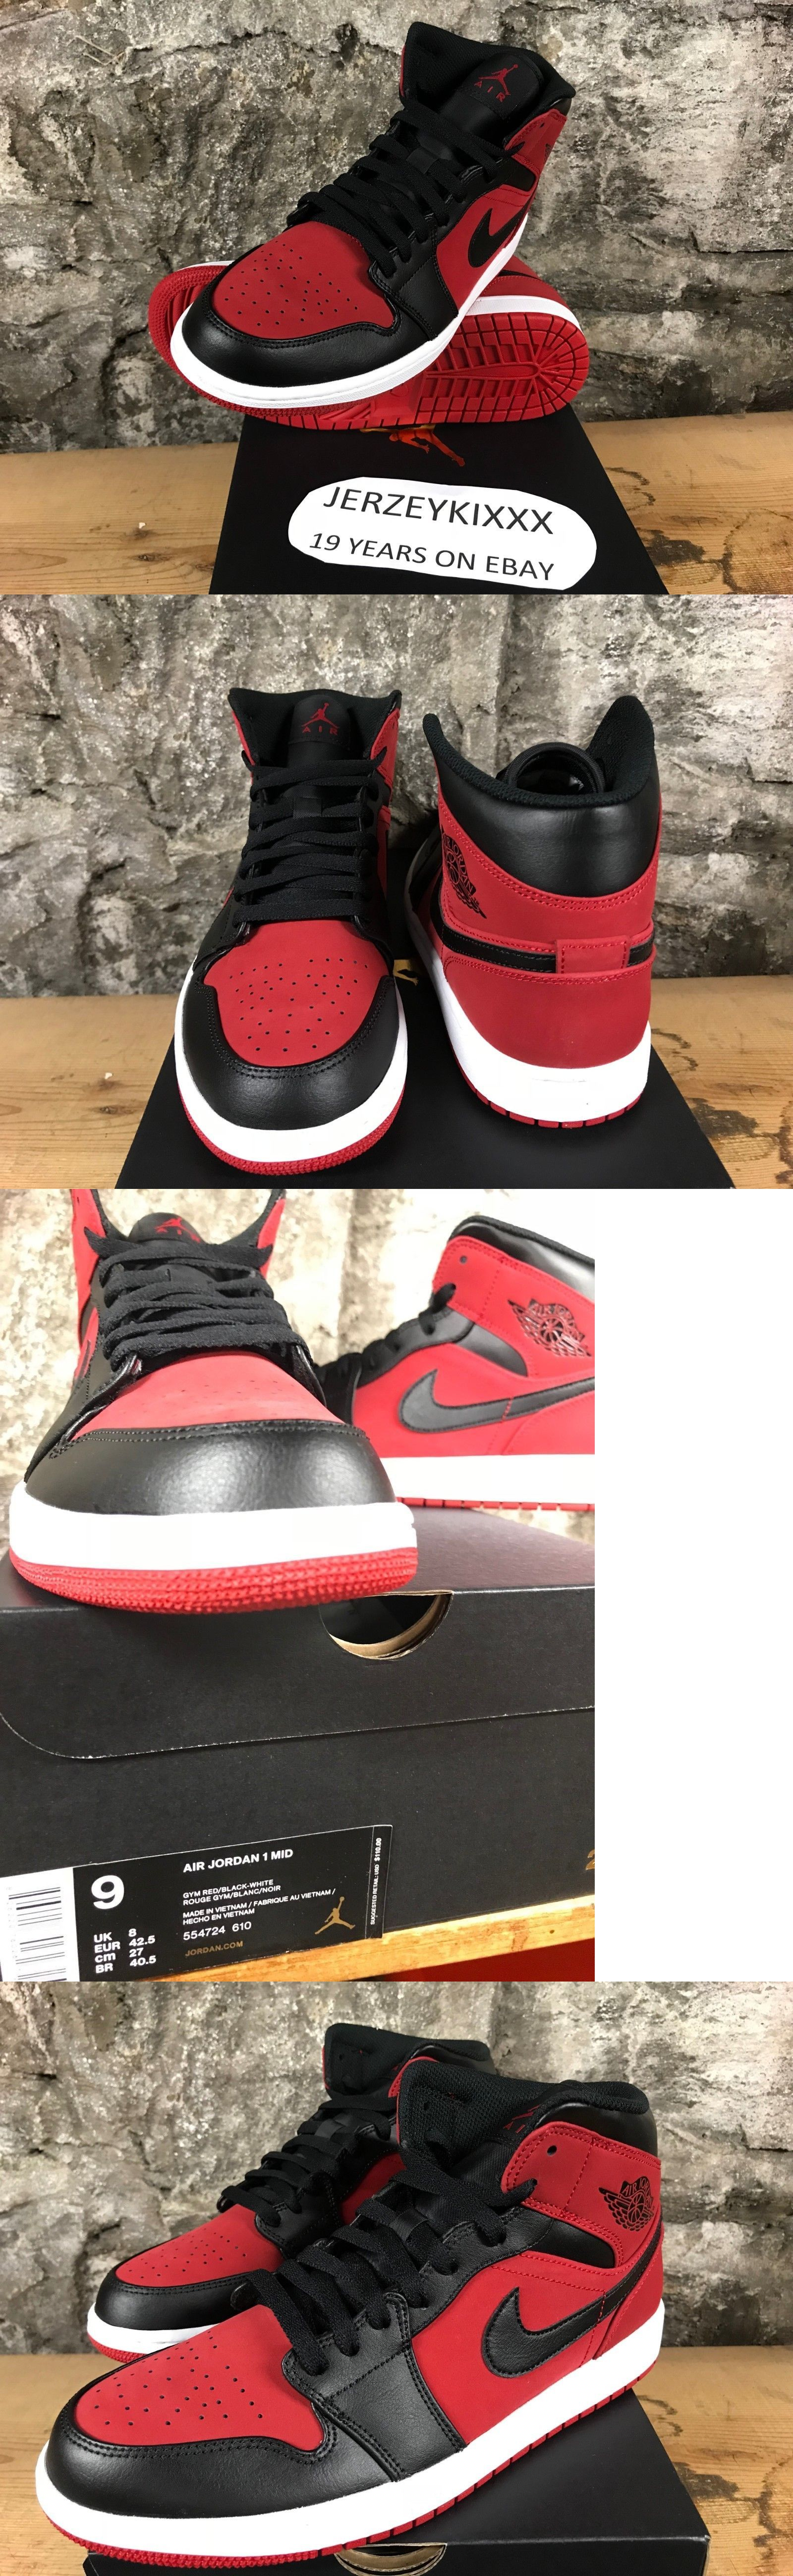 half off 0b2d6 b6a94 Mens Shoes 93427  Jordan Retro Air Jordan 1 Mid Banned Gym Red Black Men S  554724-610 Sz 13-14-15 -  BUY IT NOW ONLY   95 on  eBay  shoes  jordan   retro ...